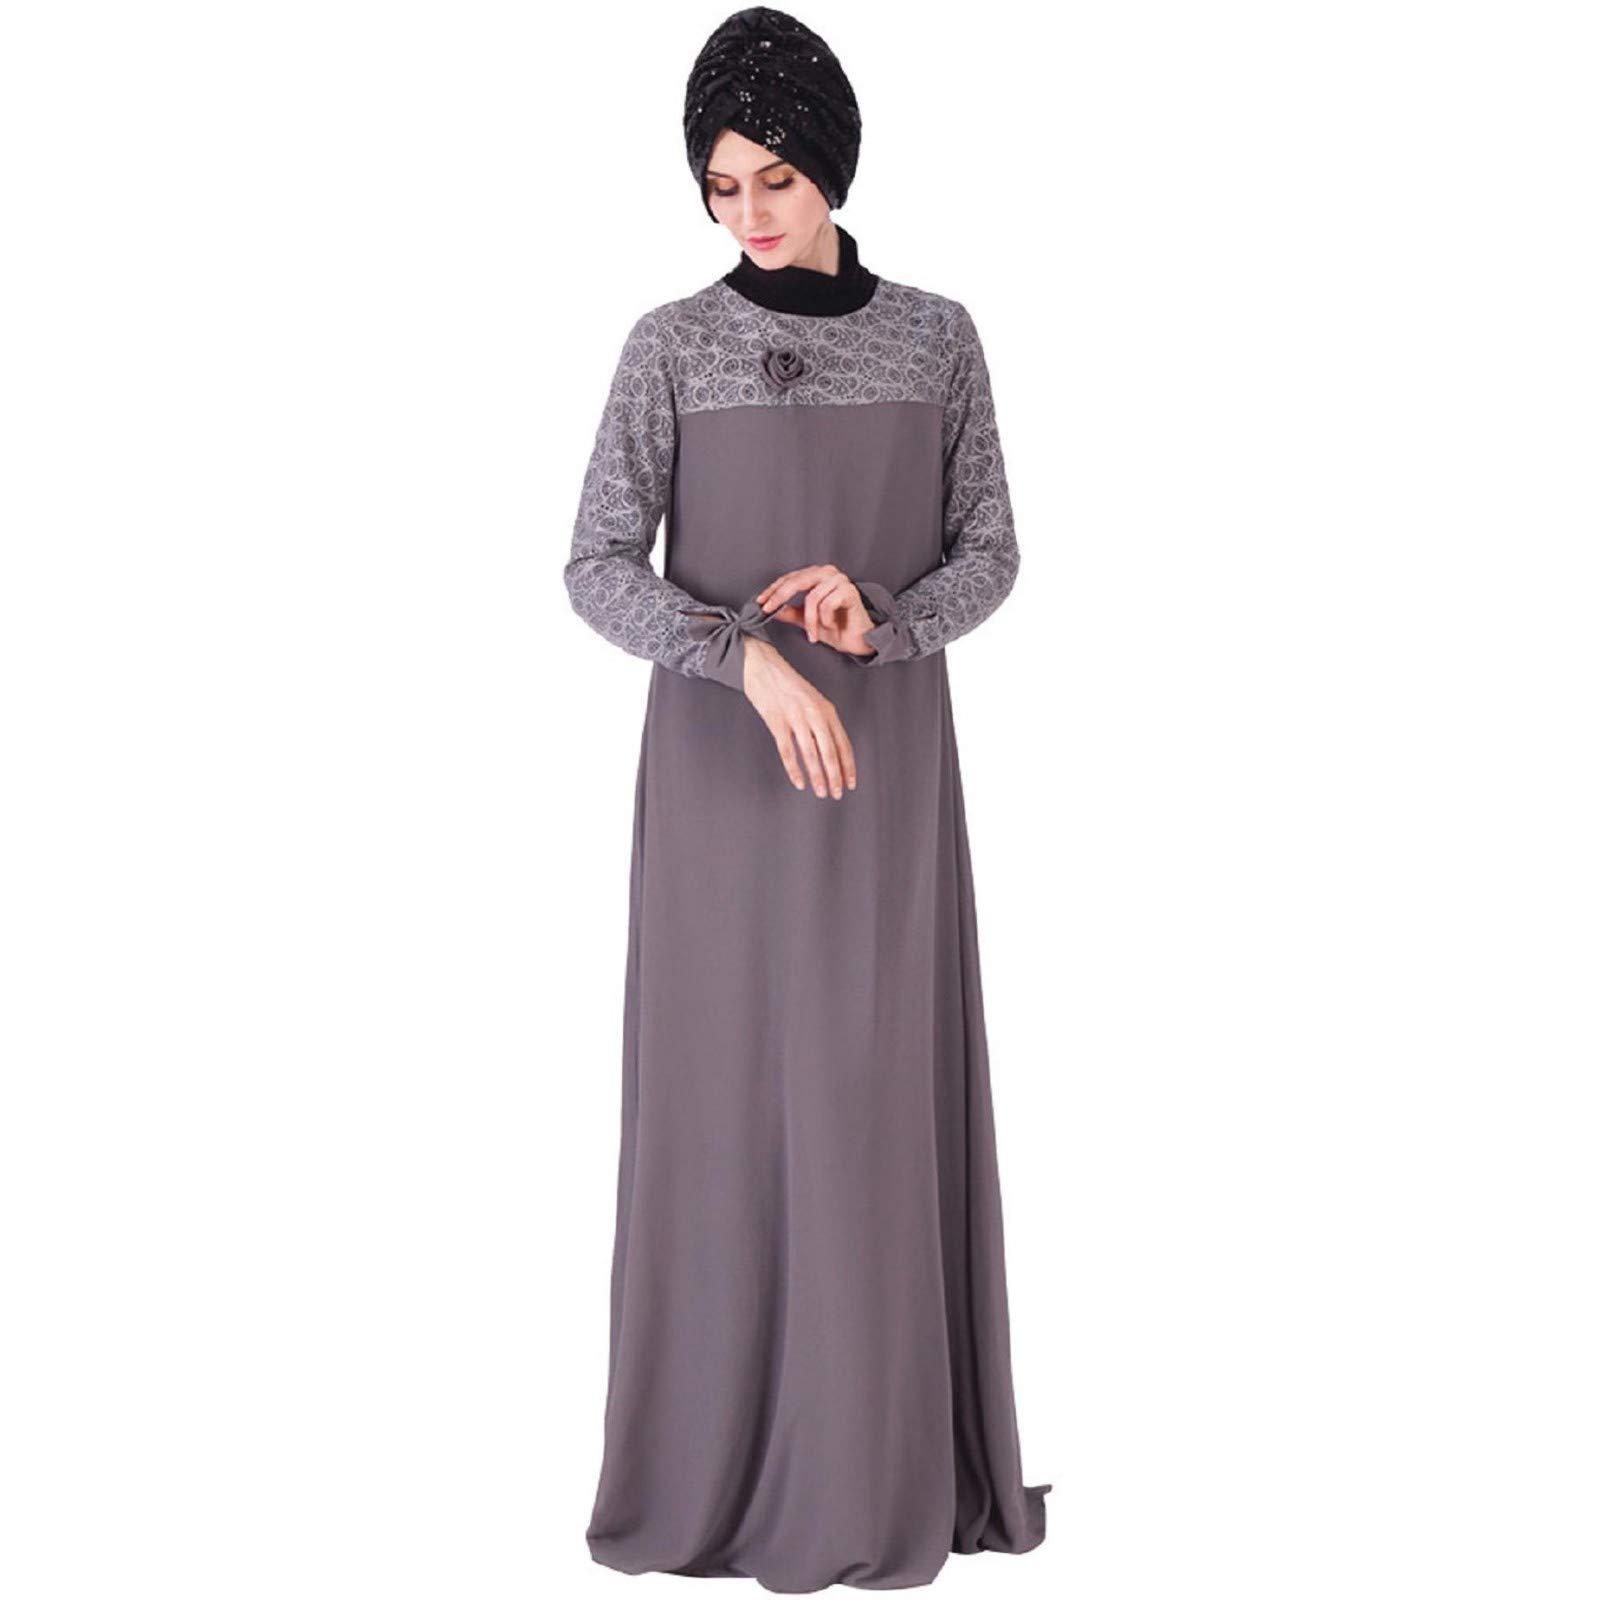 Muslim Women Kaftan Islamic Apparel Robes,Long Sleeve Printed Long Dress